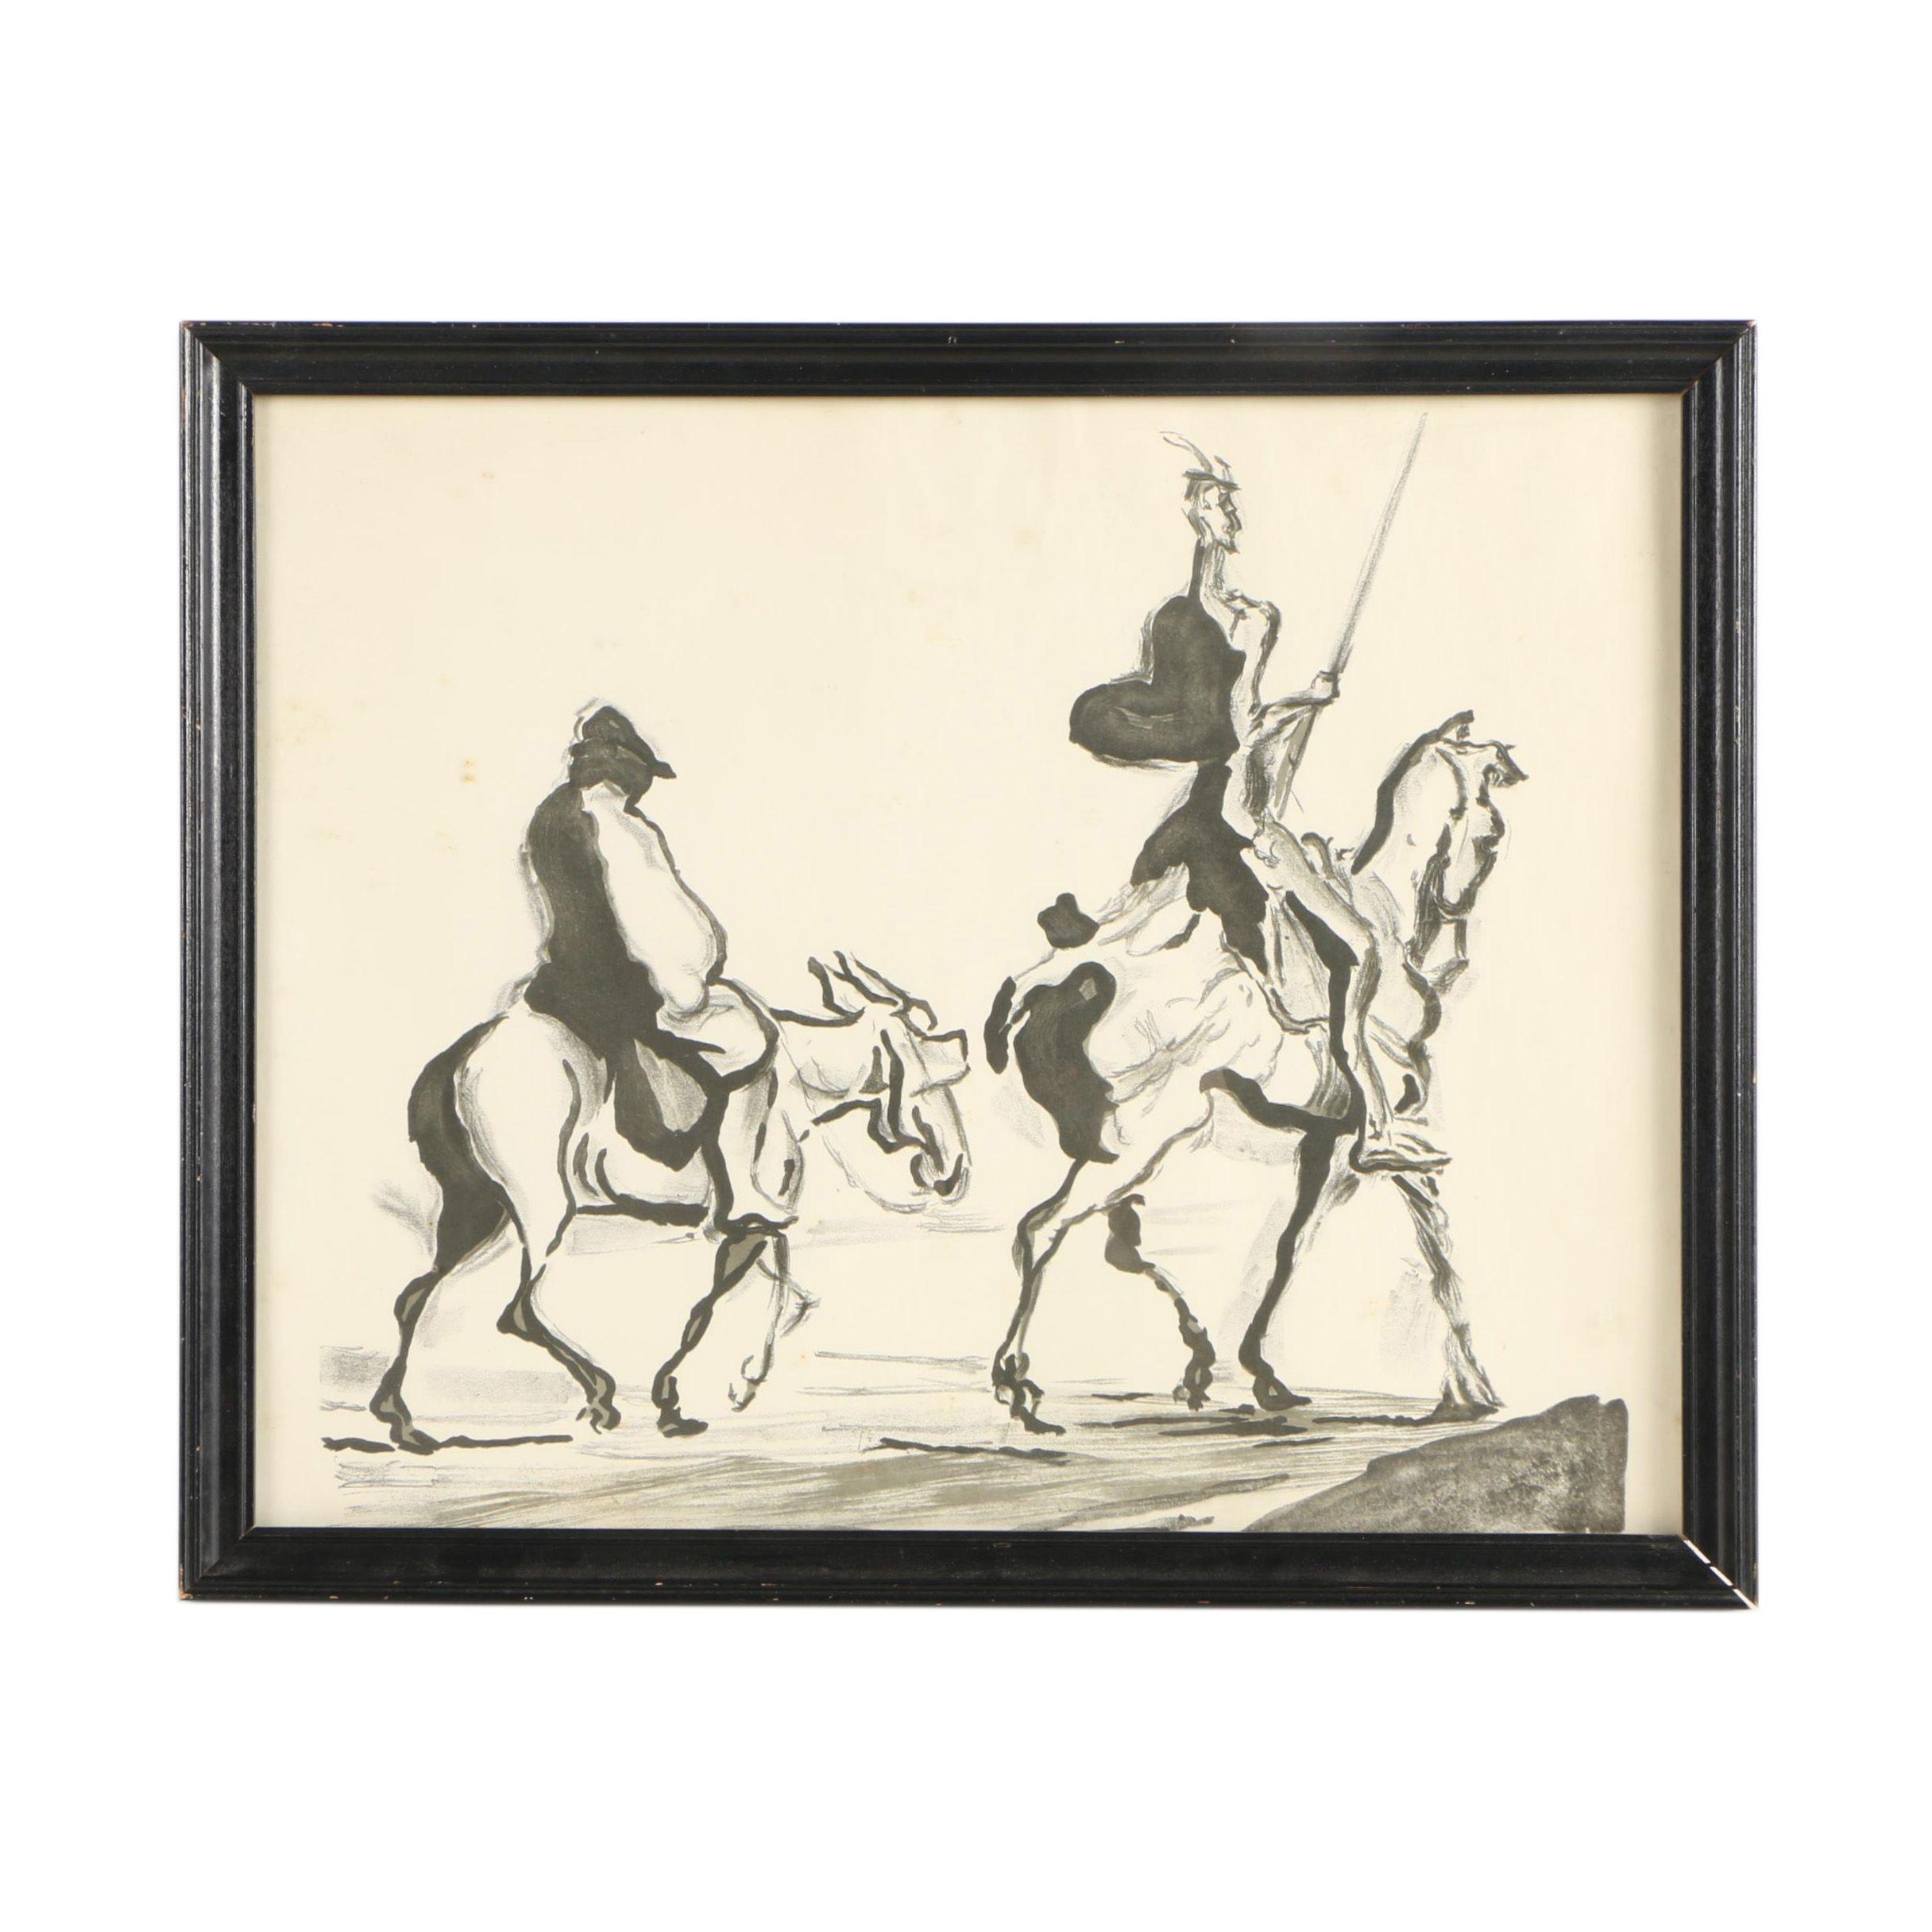 "Halftone Print After Honoré Daumier's ""Don Quixote and Sancho Panza"""